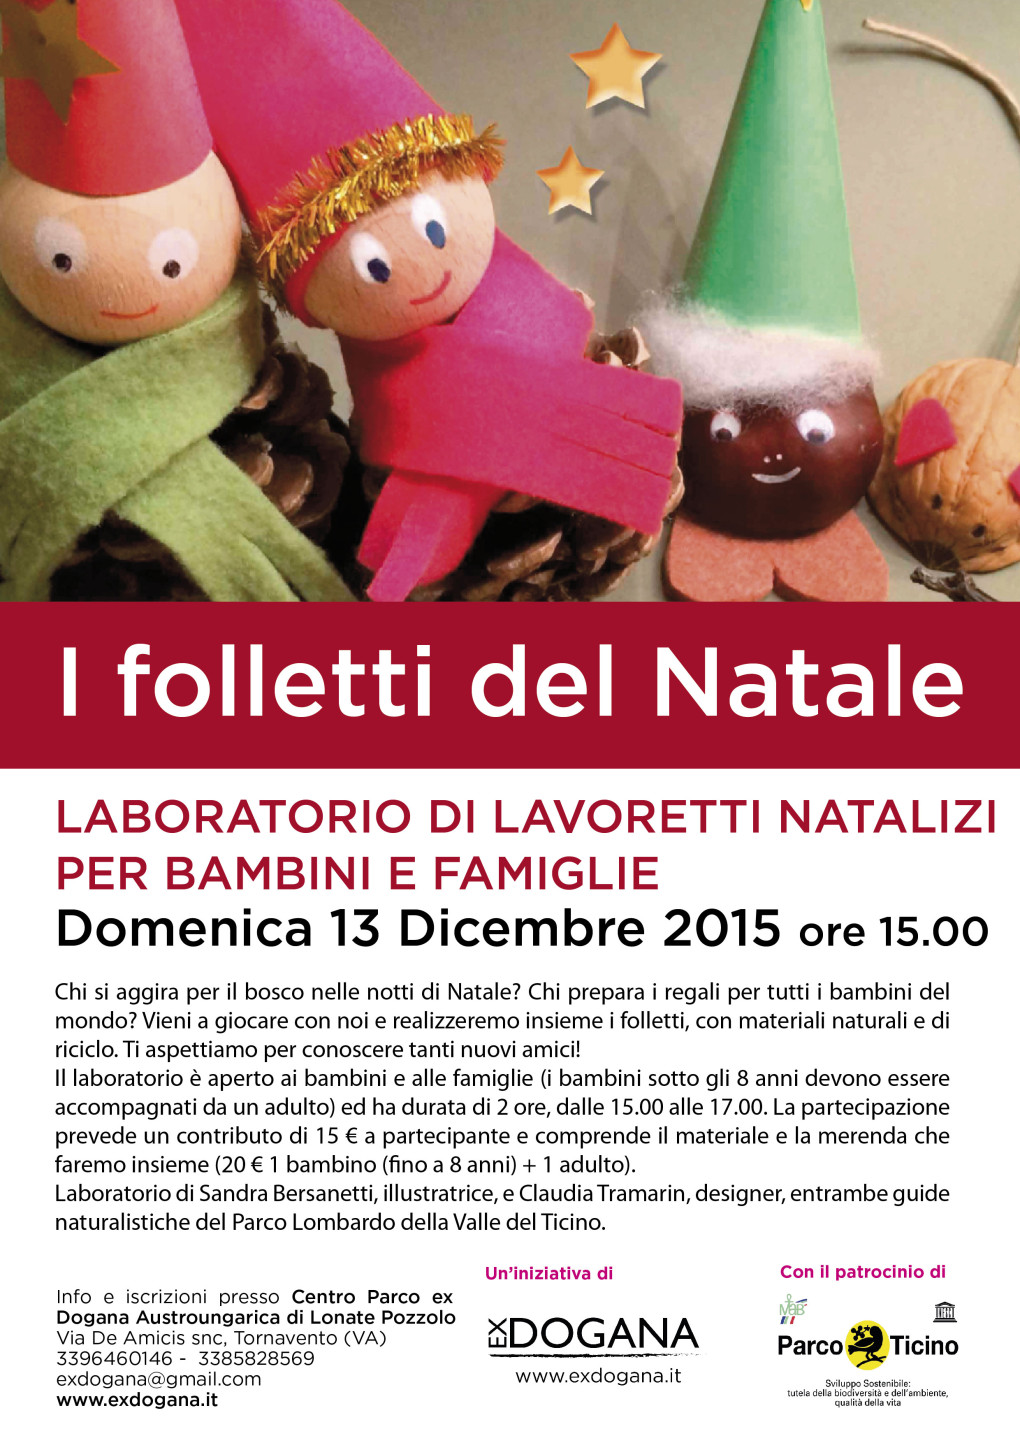 lab_natale-02